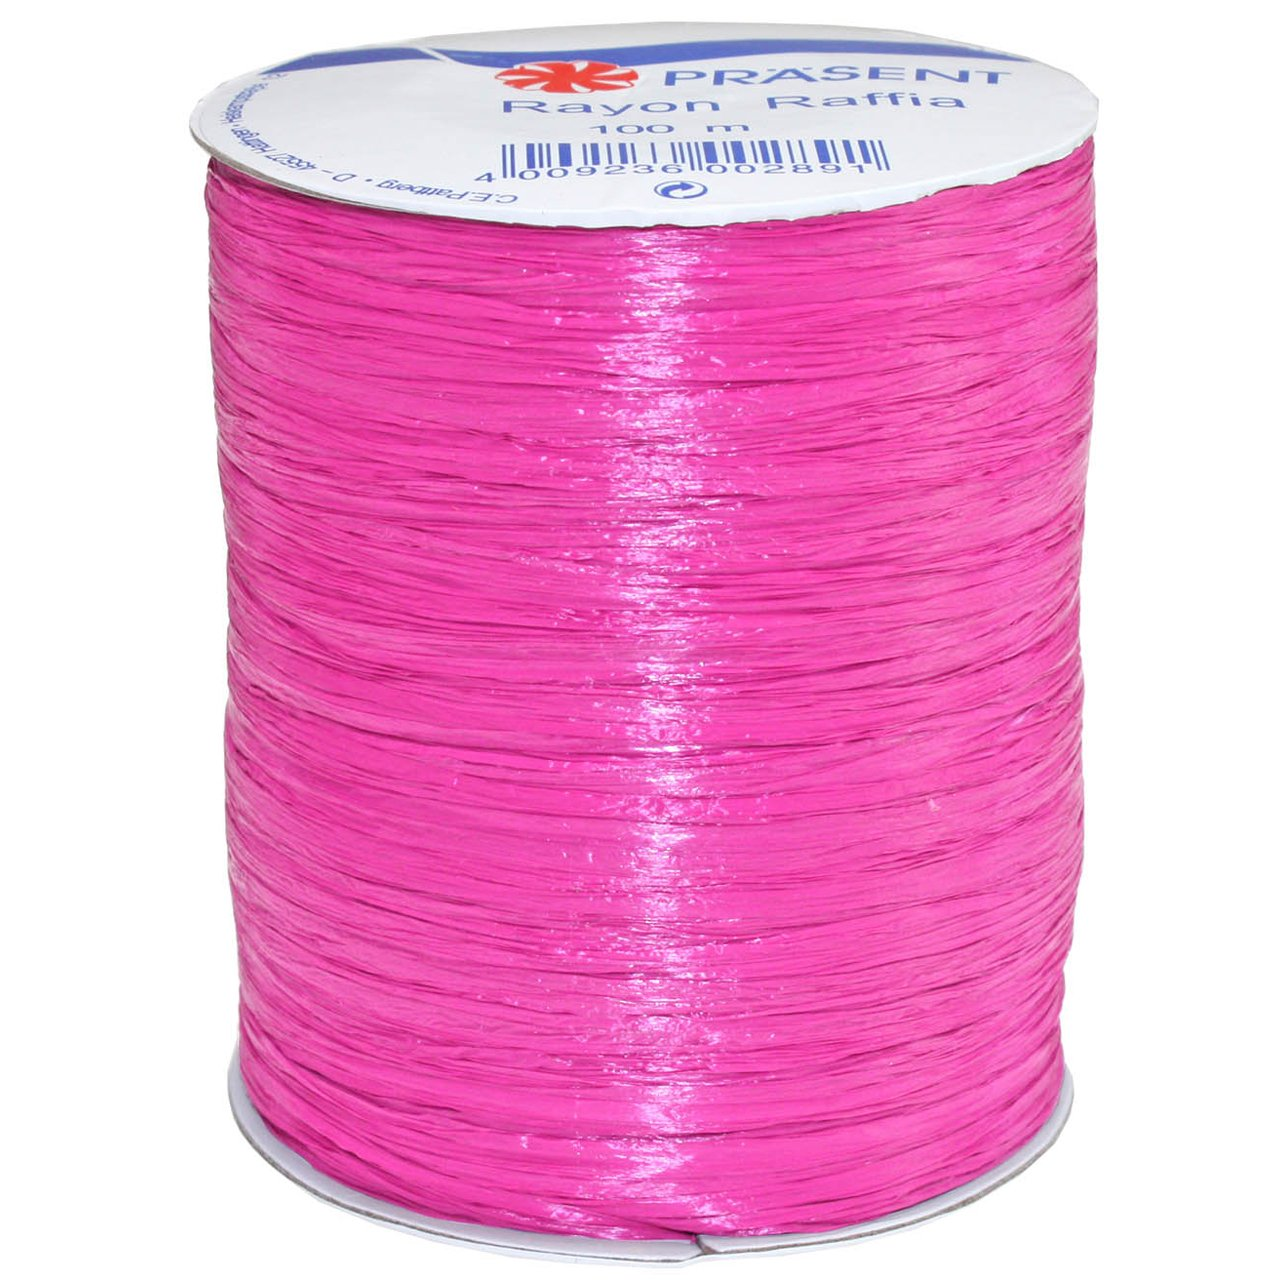 100-Yard White Morex Ribbon Rayon Raffia Fabric Ribbon Spool